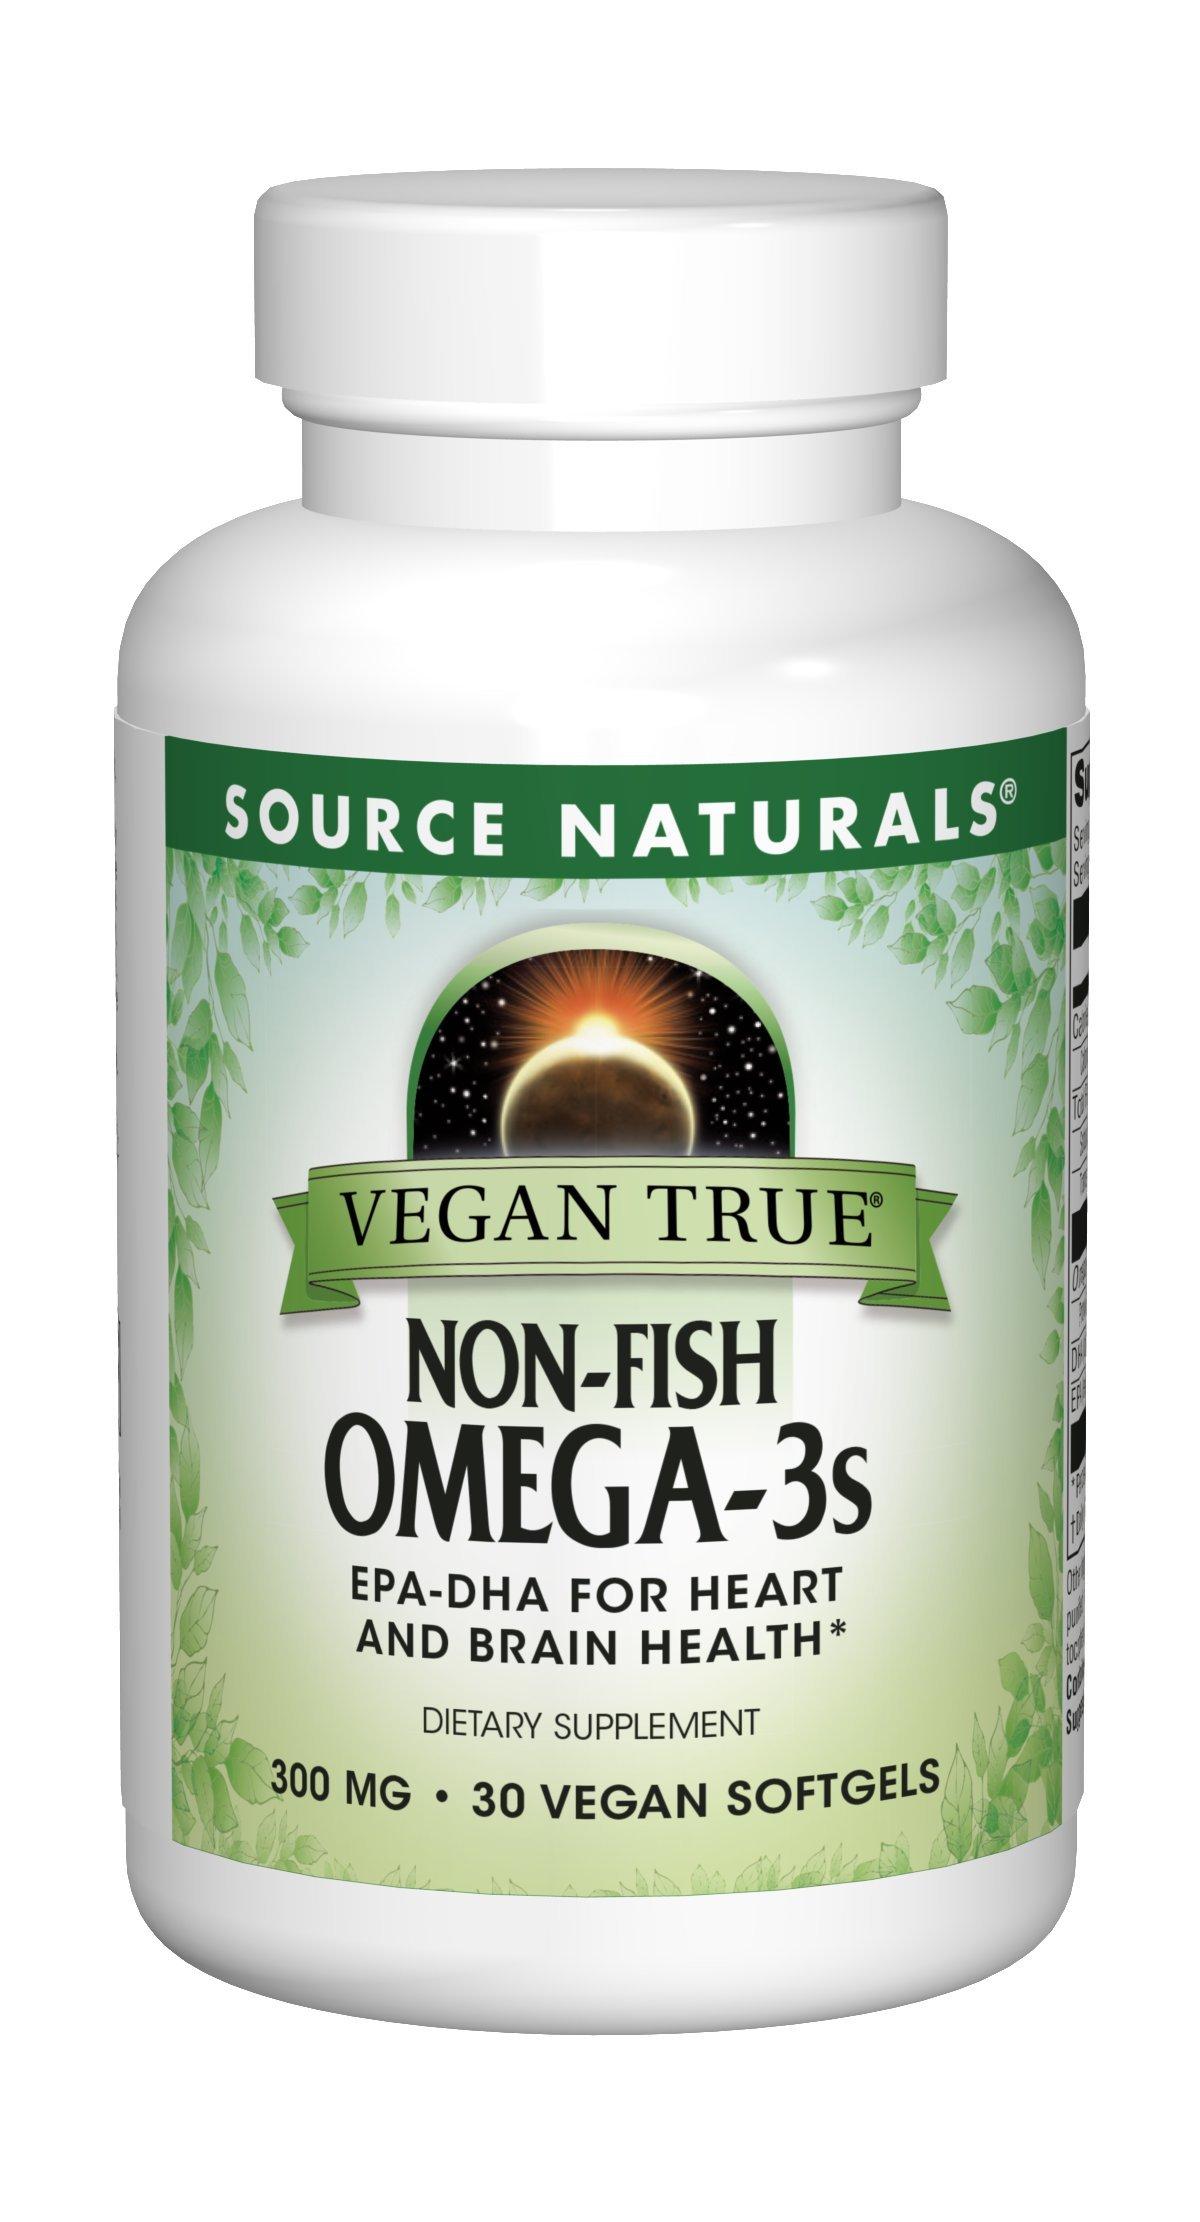 Source Naturals Vegan True Non-Fish Omega-3s EPA-DHA for Heart and Brain Health, (30 Capsules)